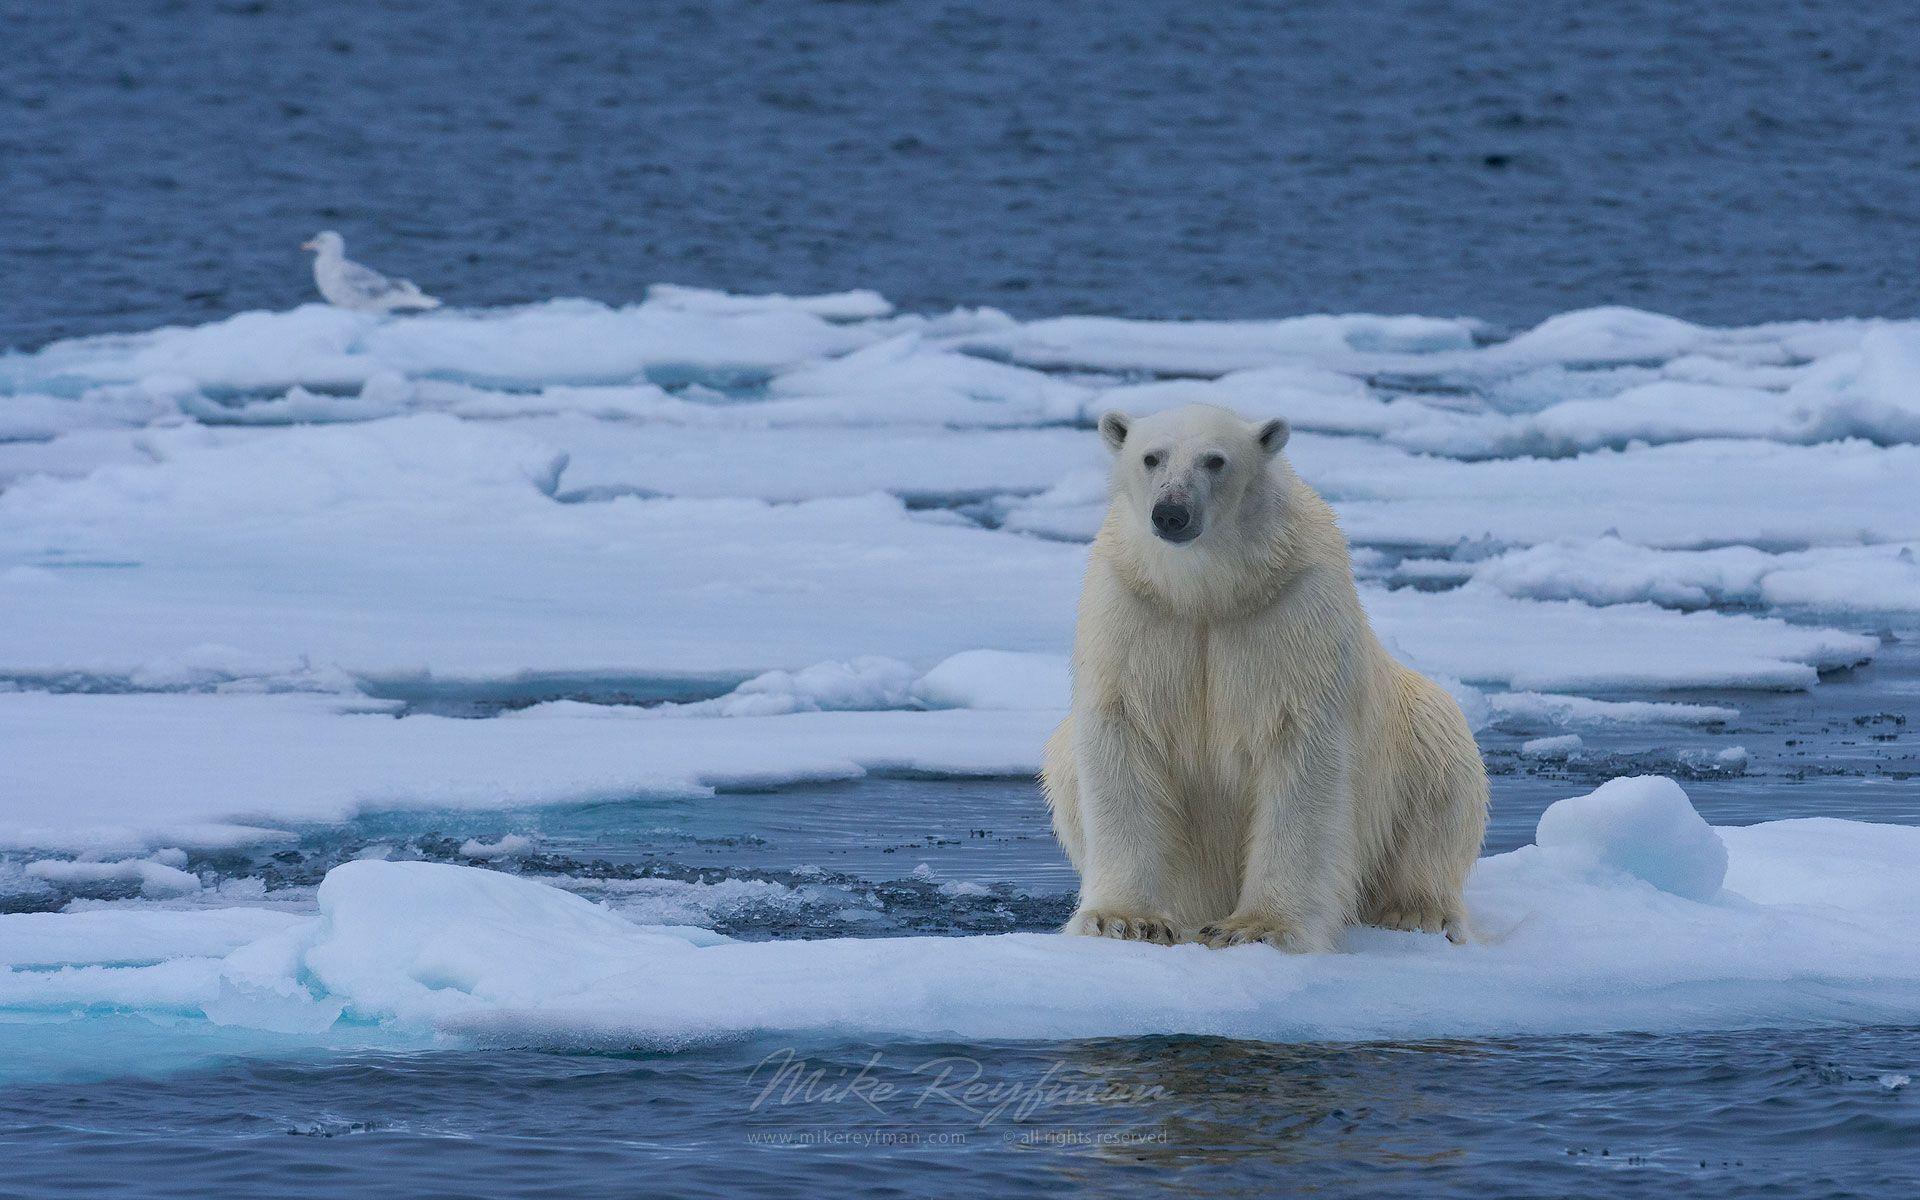 🔥 25+ Best Memes About Ice Bear | Ice Bear Memes